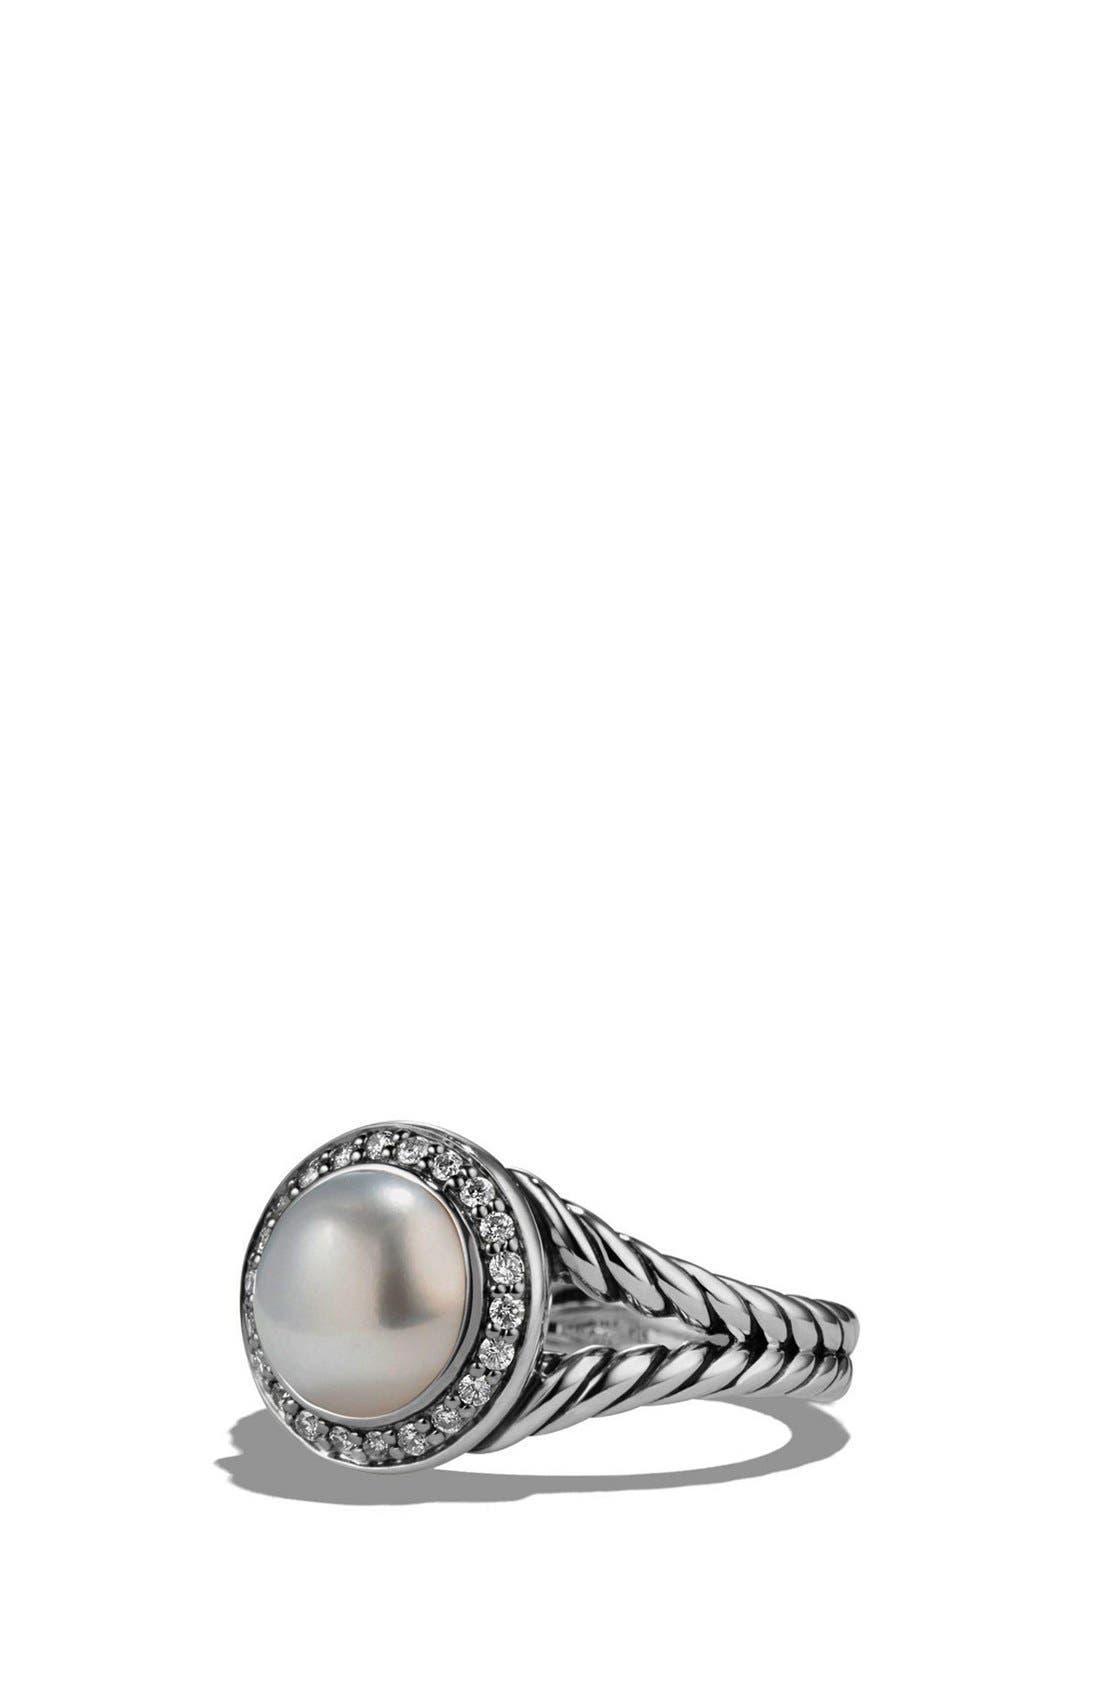 DAVID YURMAN Cerise Ring with Pearl and Diamonds